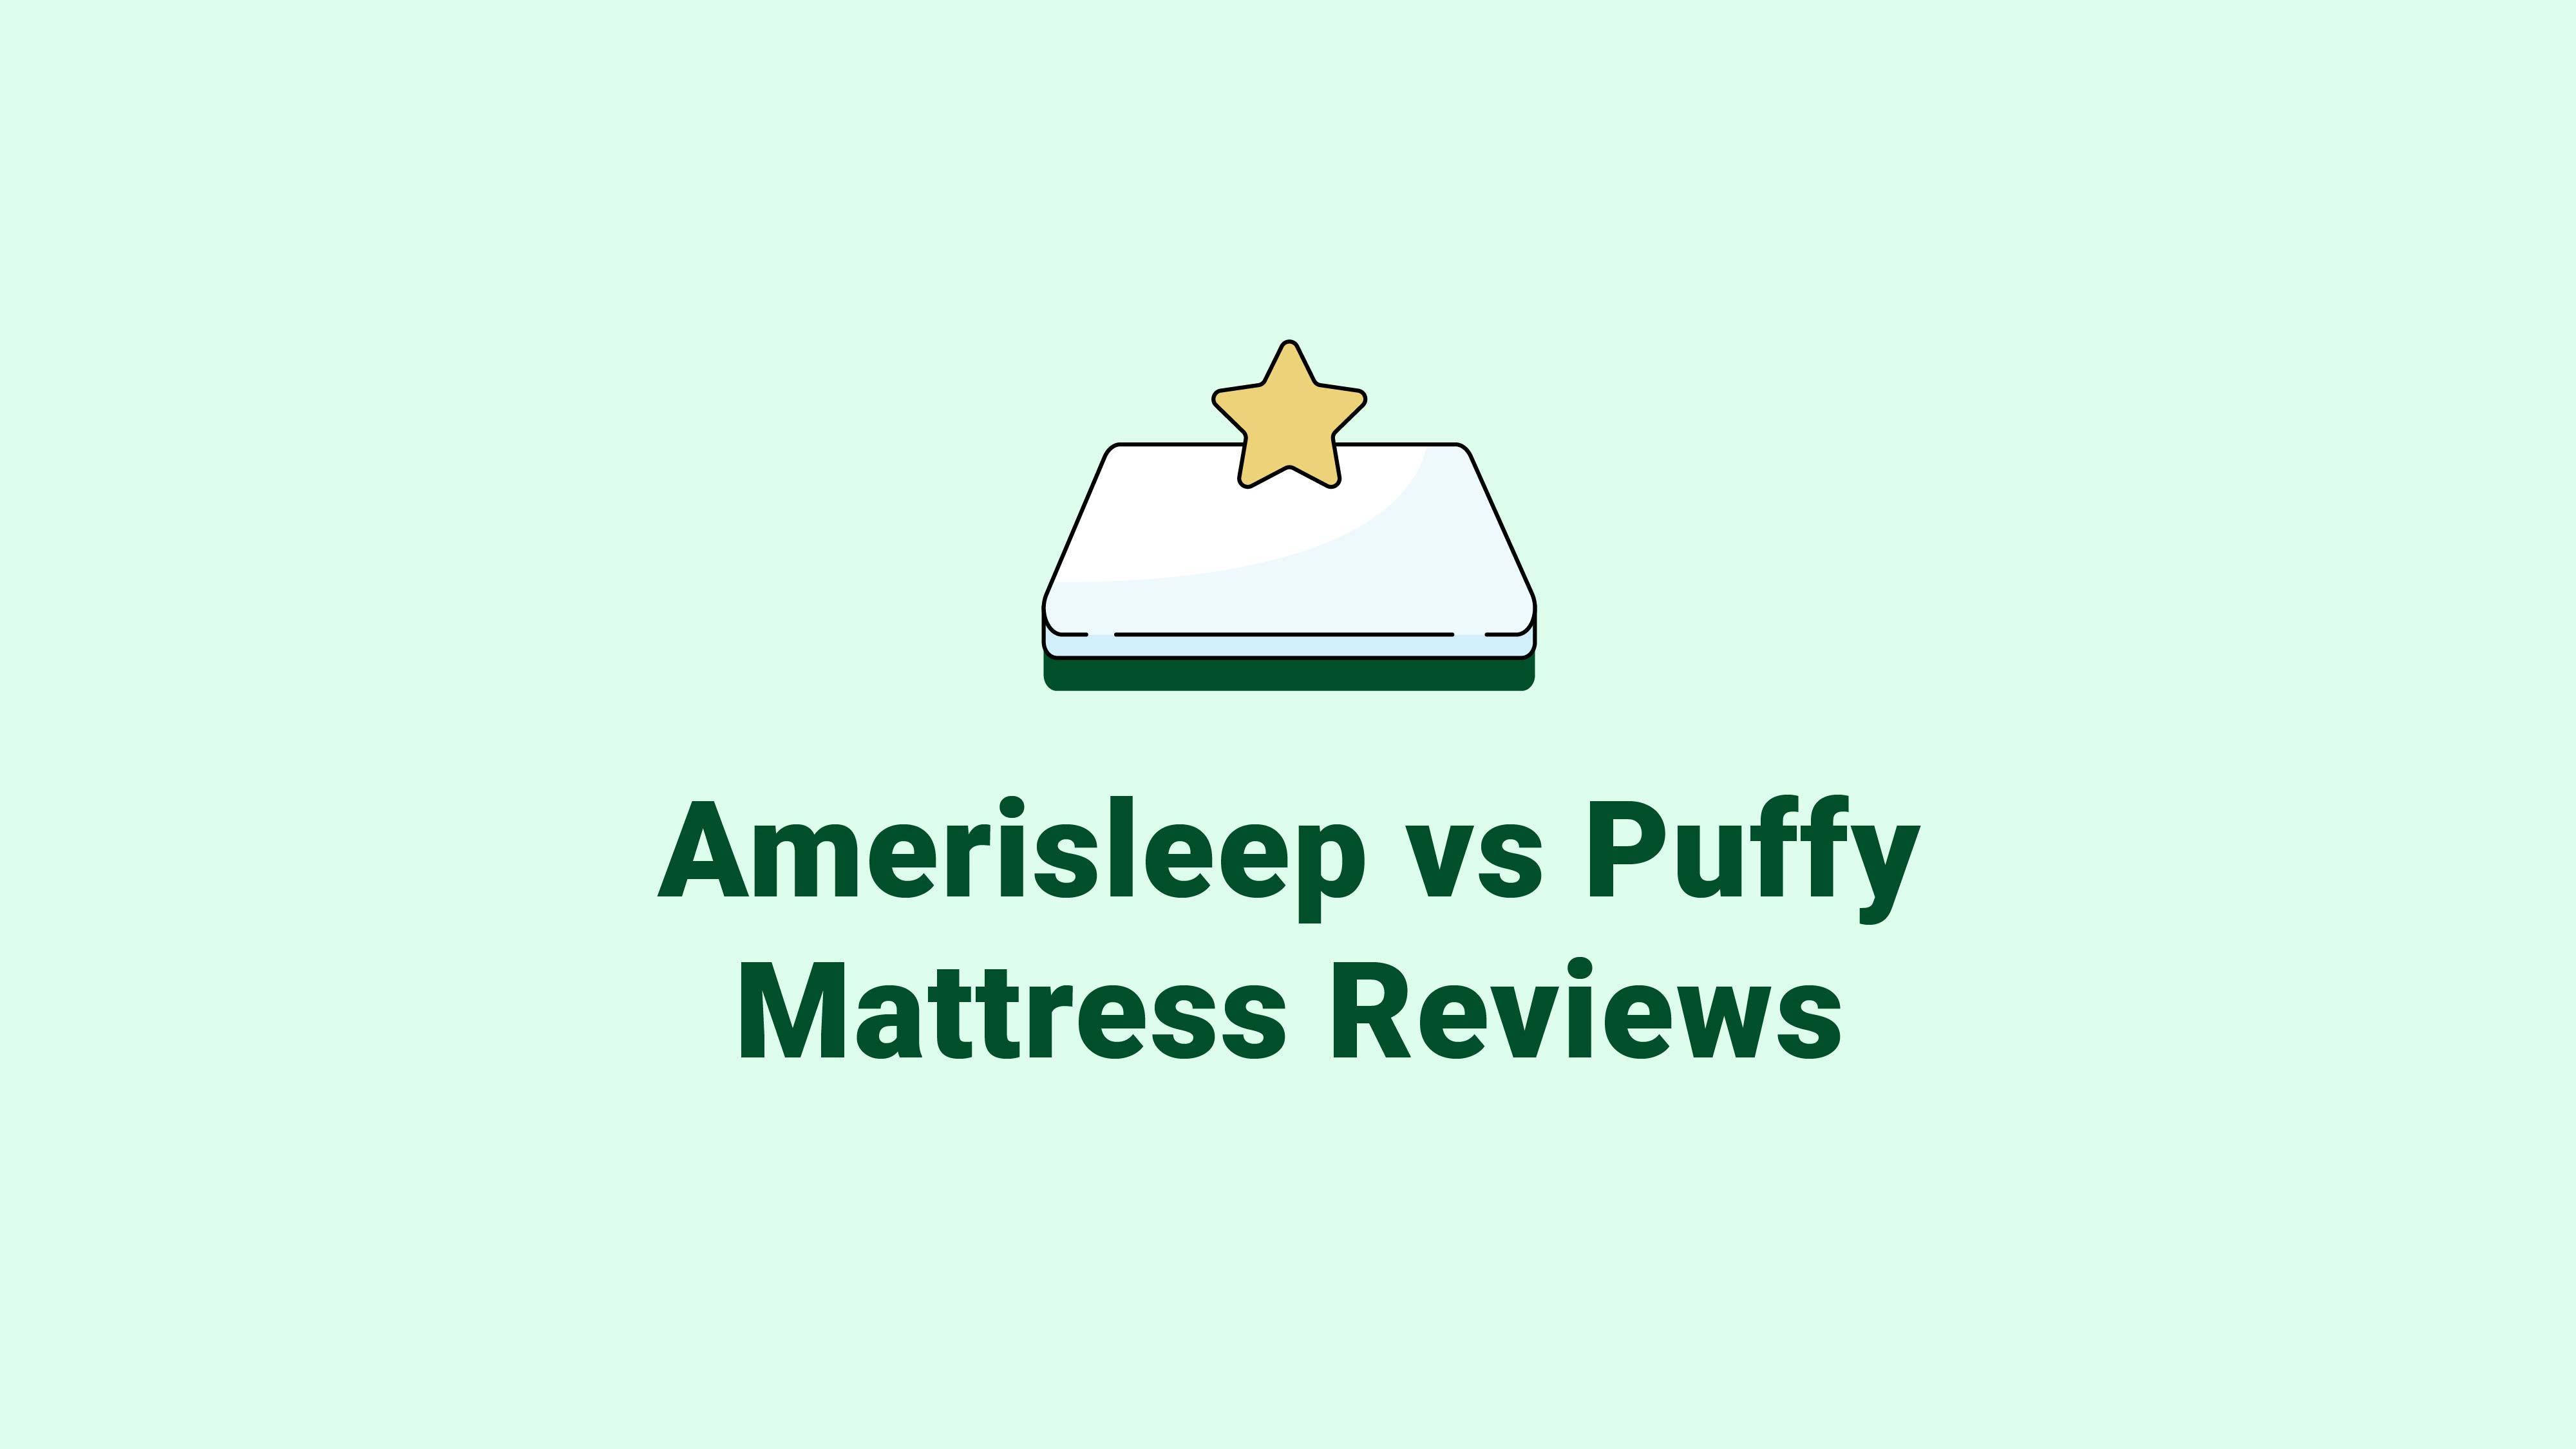 Amerisleep vs. Puffy Mattress Reviews